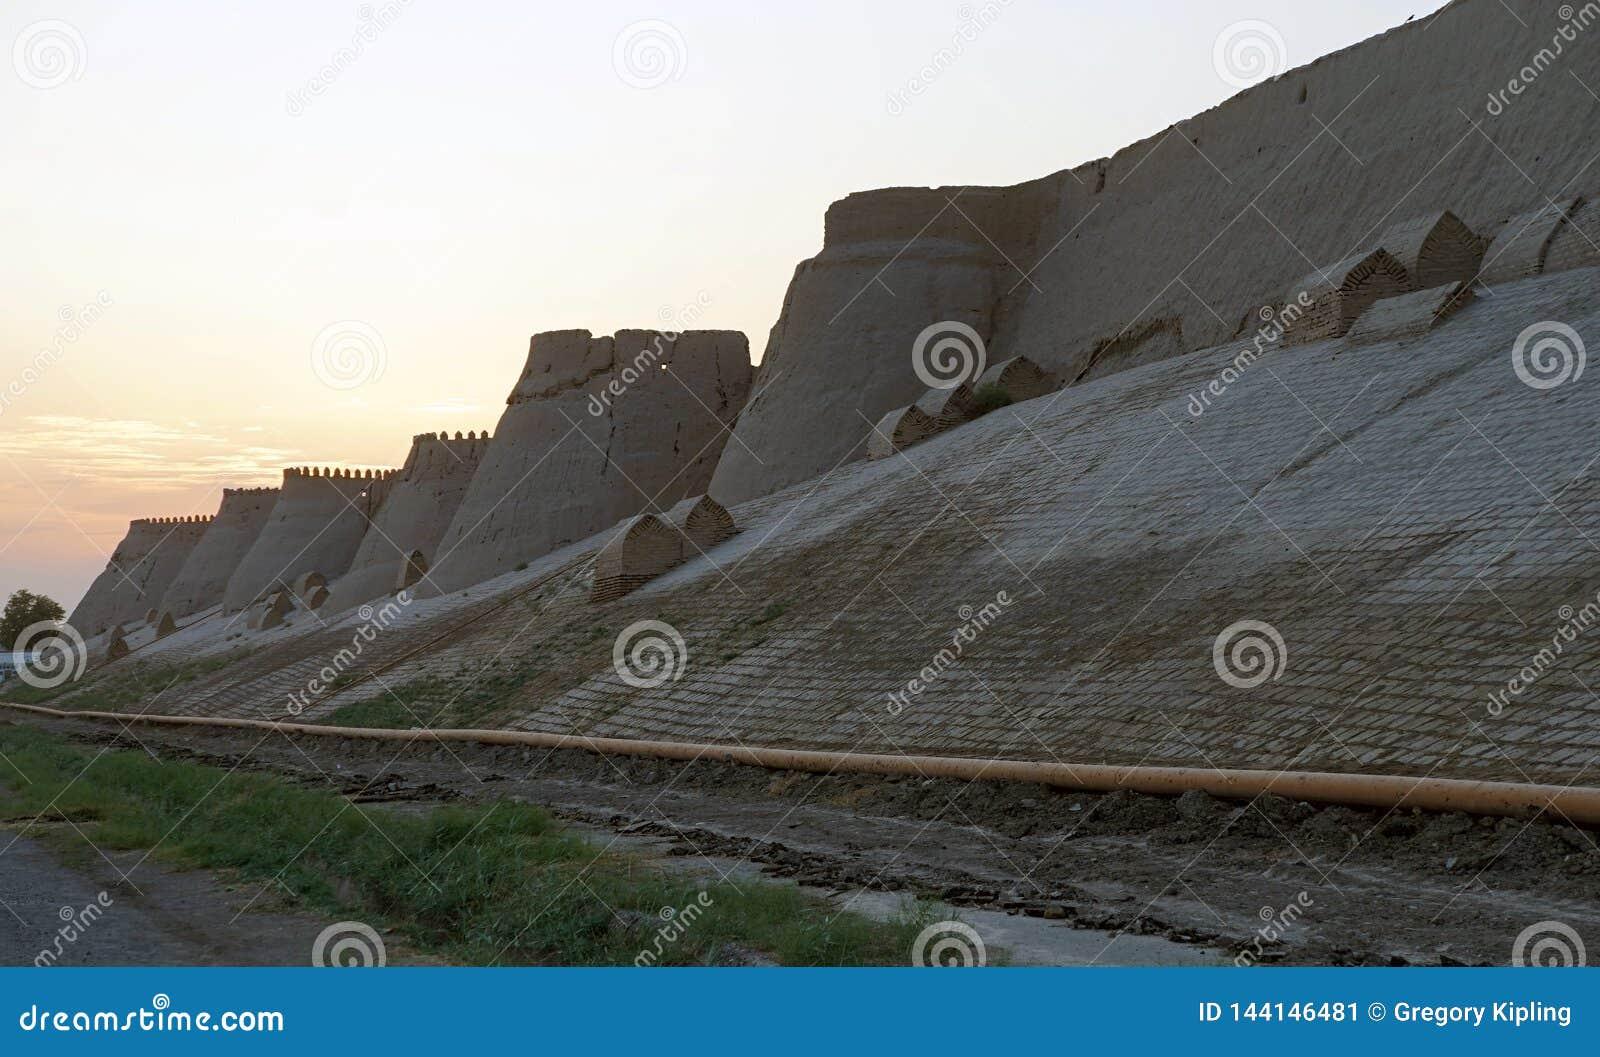 Walls of Khiva's Itchan Kala at sunset, Uzbekistan